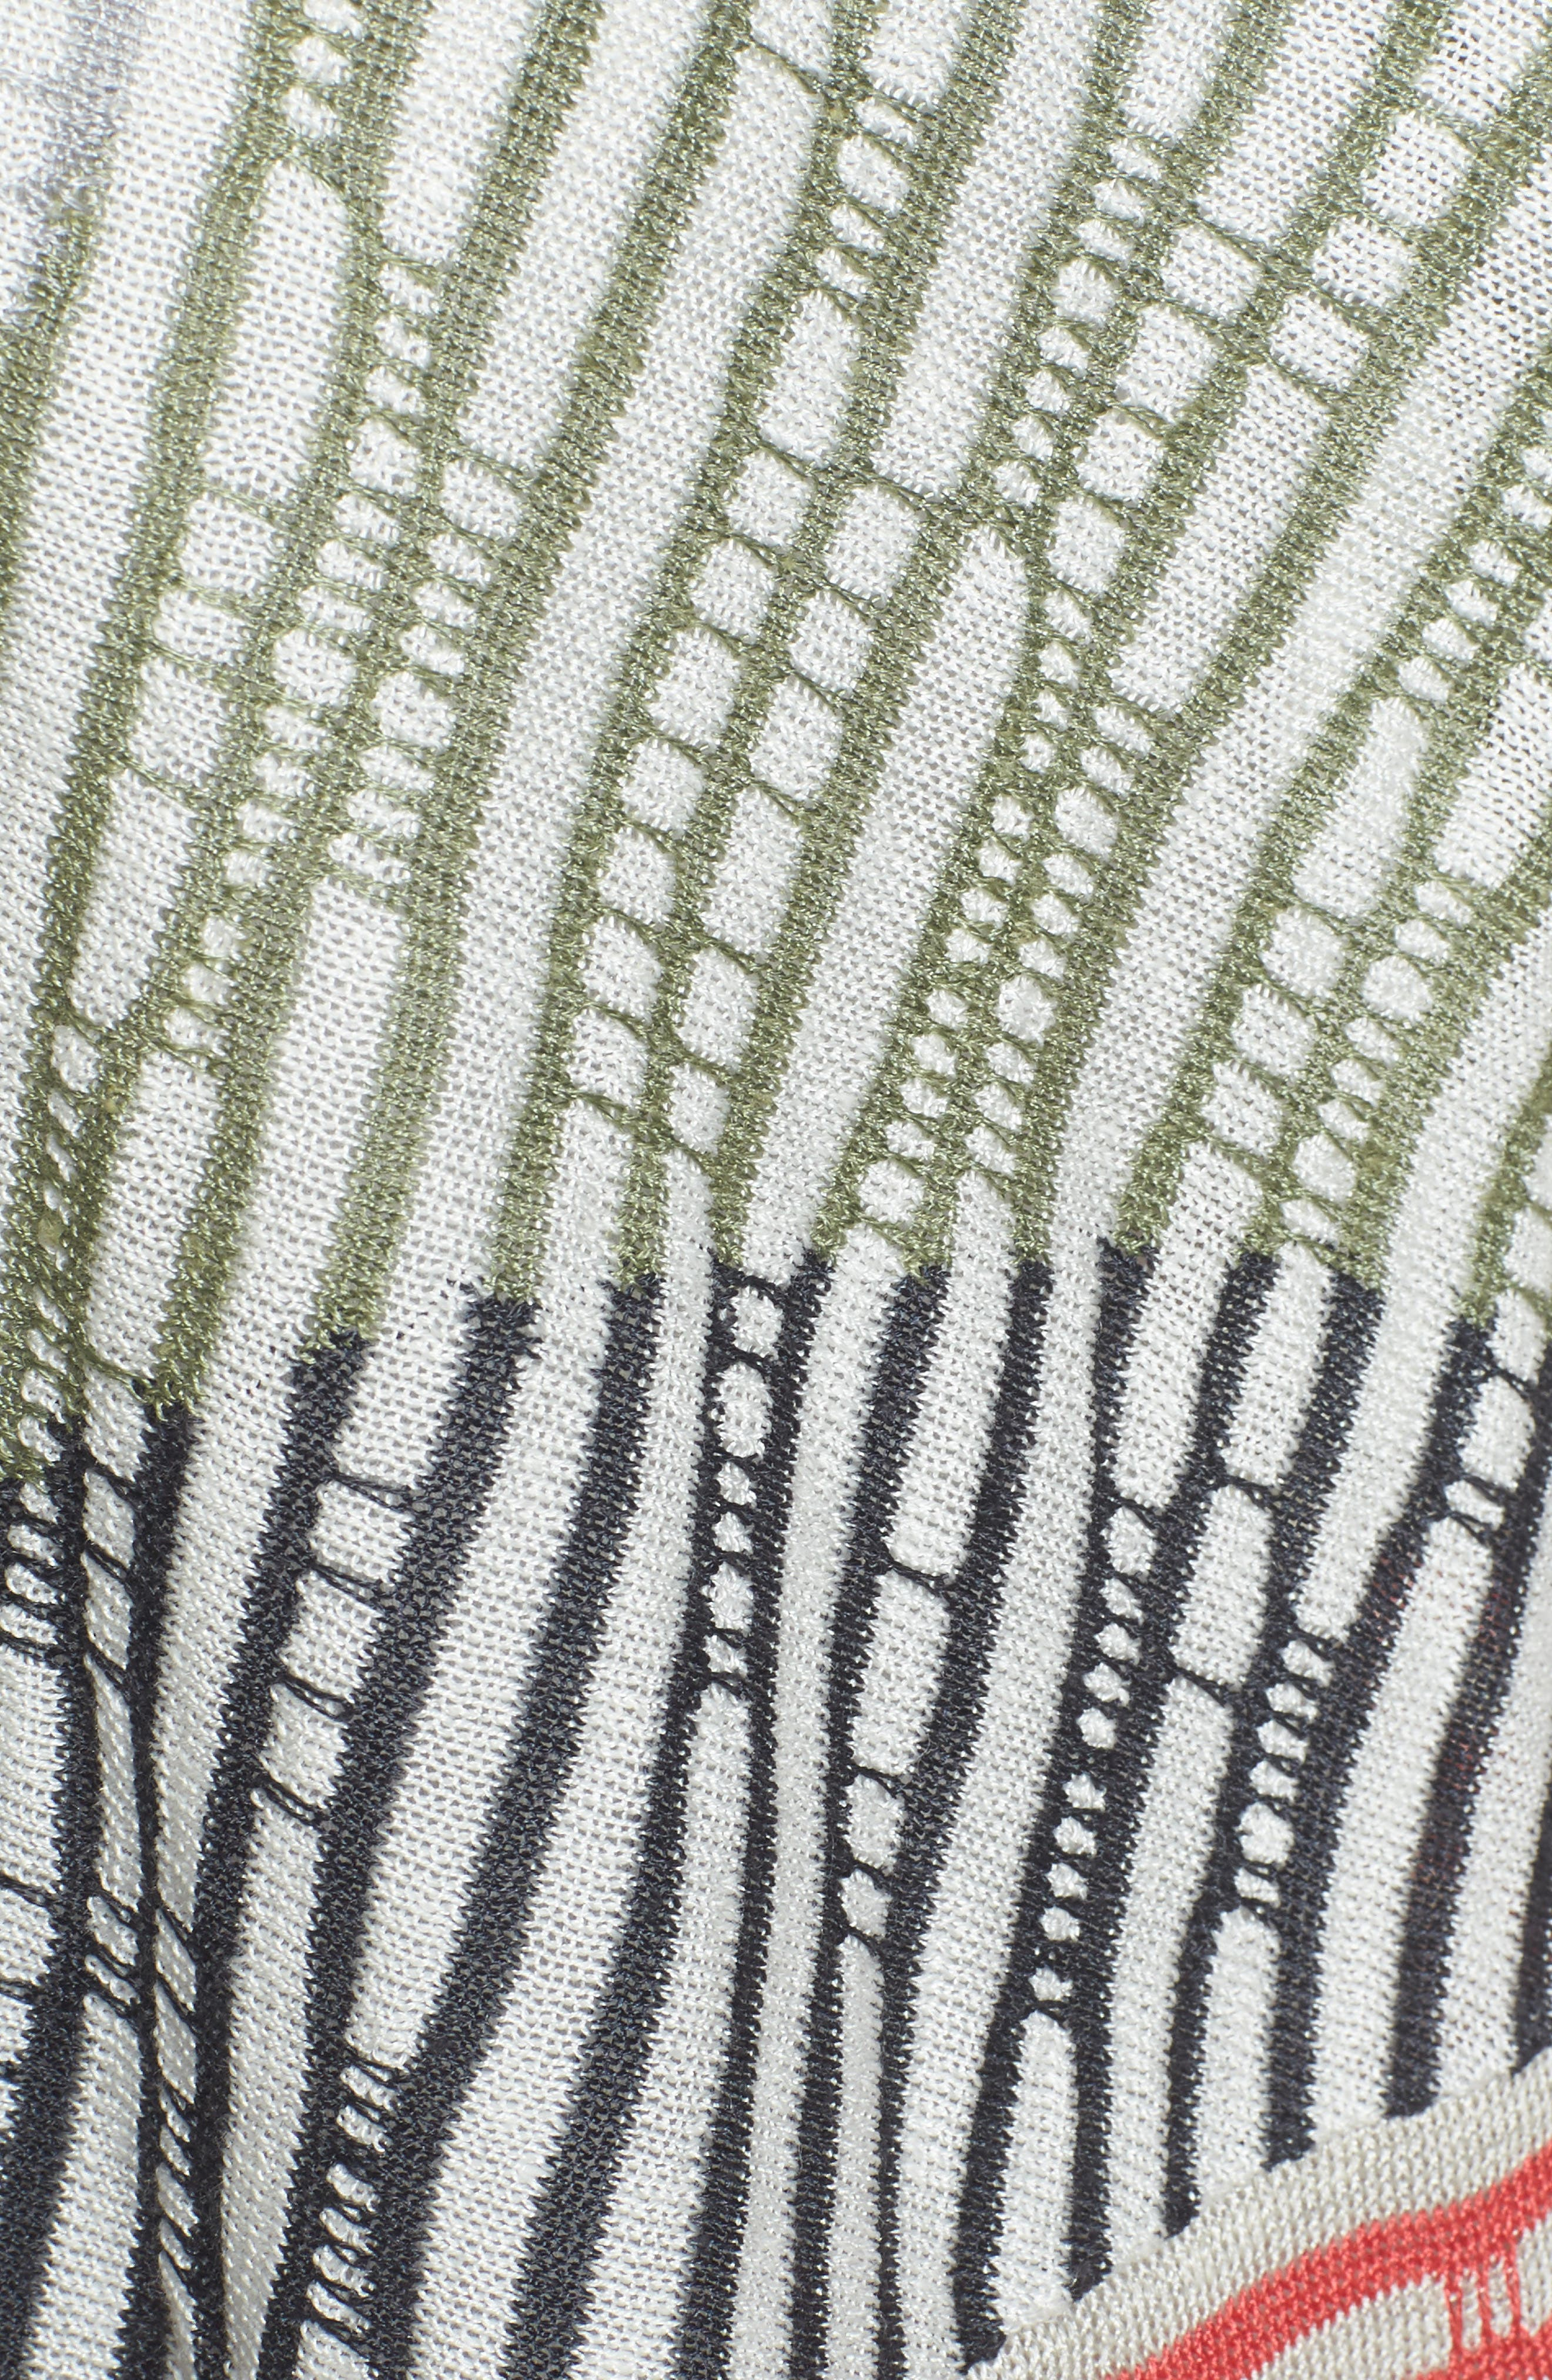 Stitch Blocked 4-Way Cardigan,                             Alternate thumbnail 5, color,                             Multi